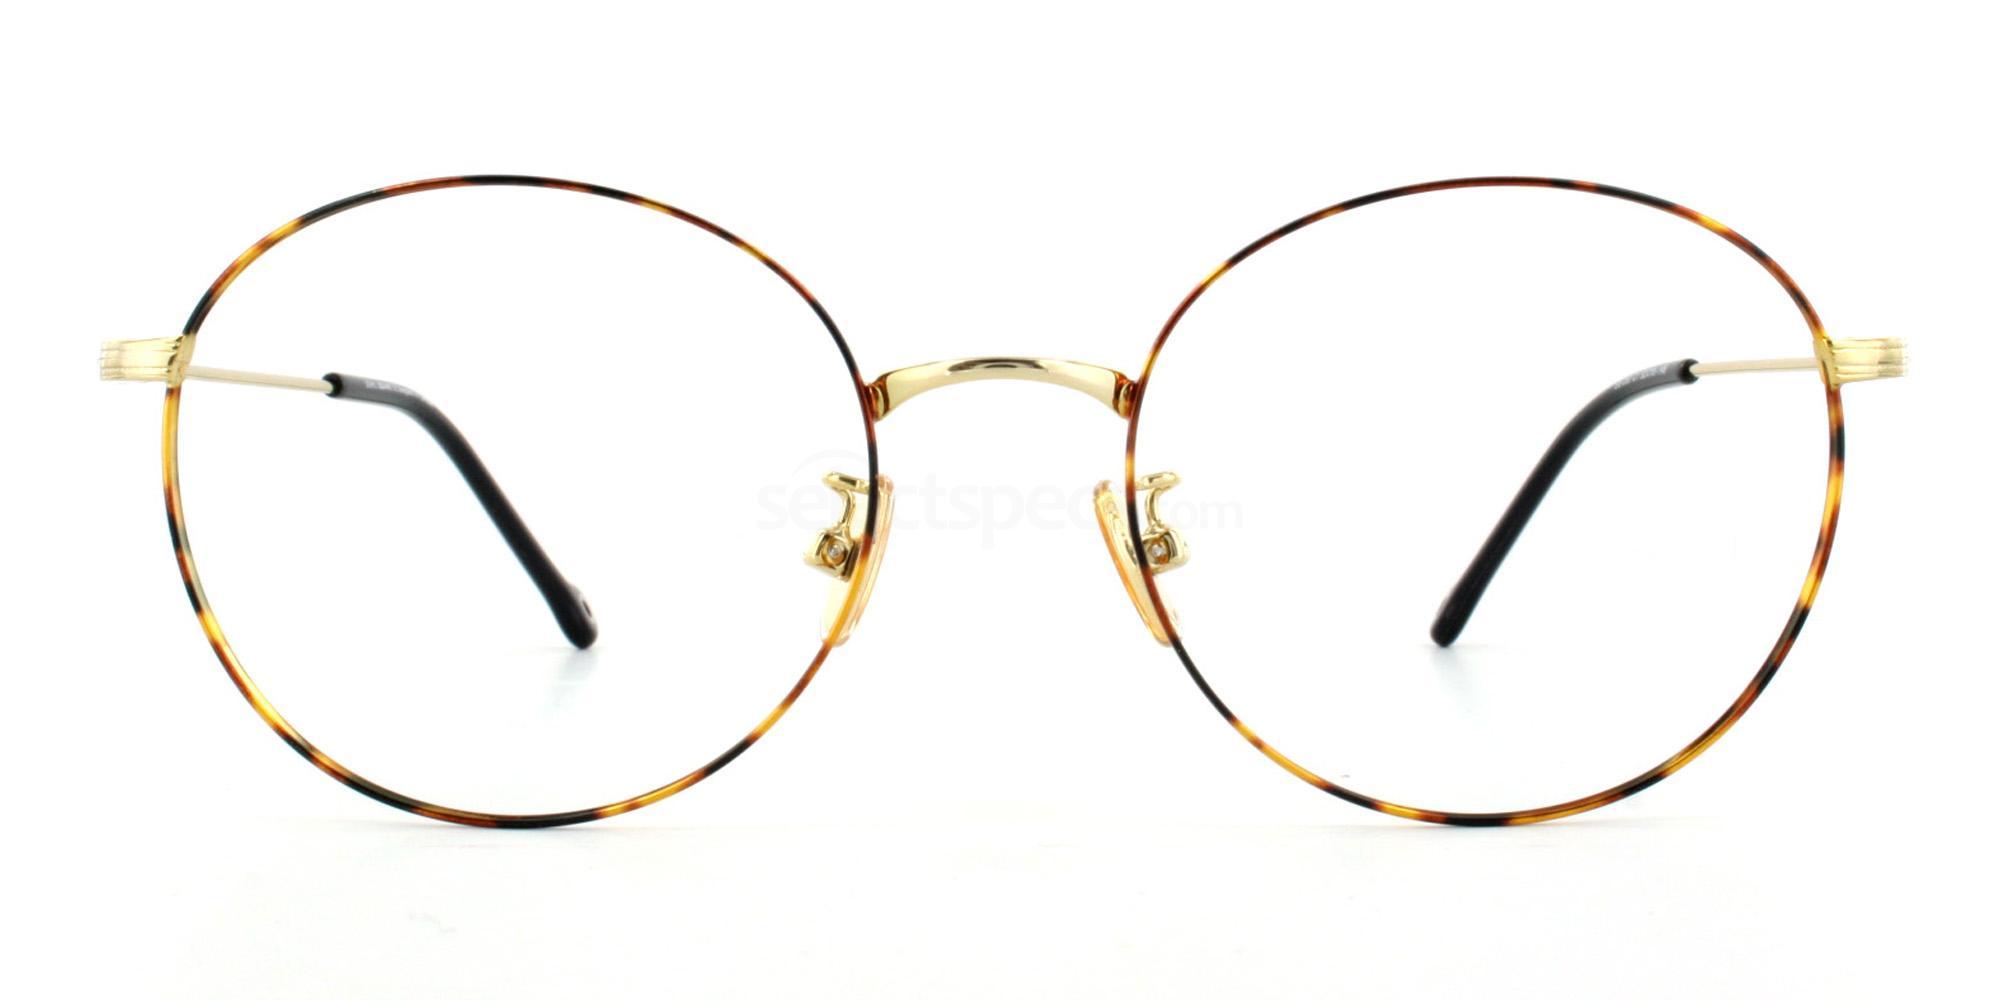 C1 SS 050 Glasses, Soho Square